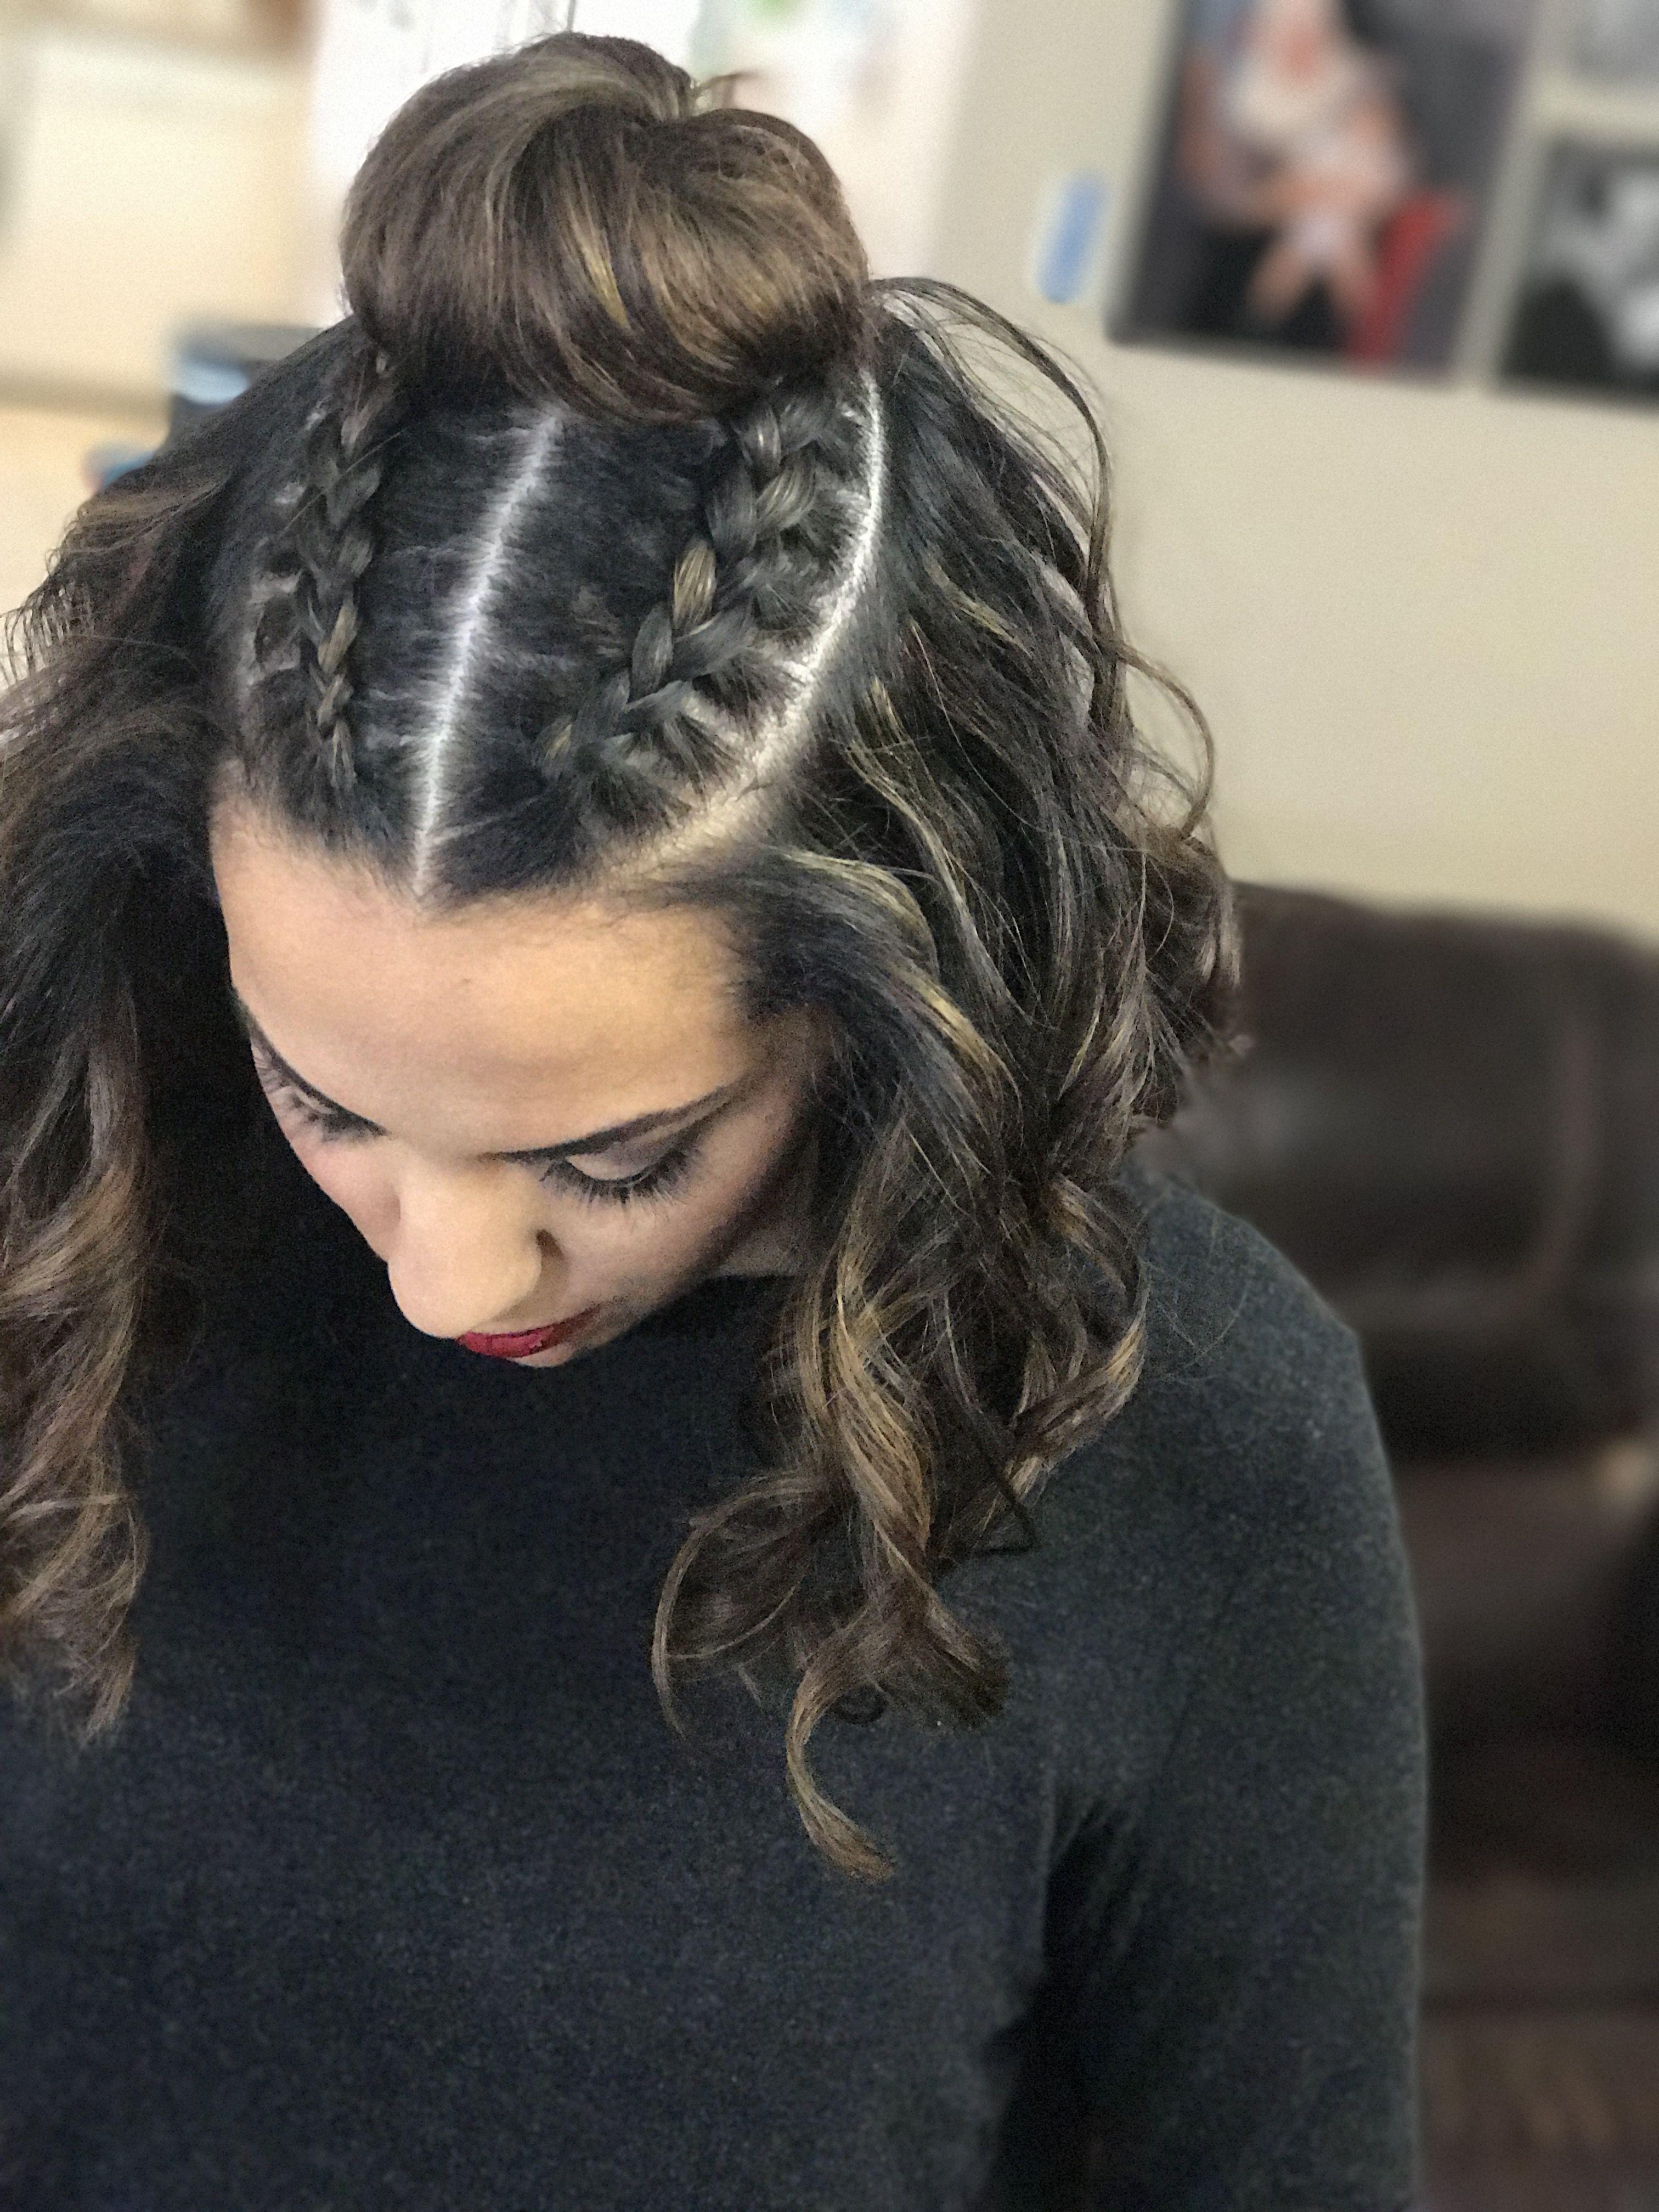 Top Knot Loose Curls Desithediva Topknot Braids Halfup Braidideas Btcpics Braids Braids With Curls Two Braid Hairstyles Braids For Short Hair